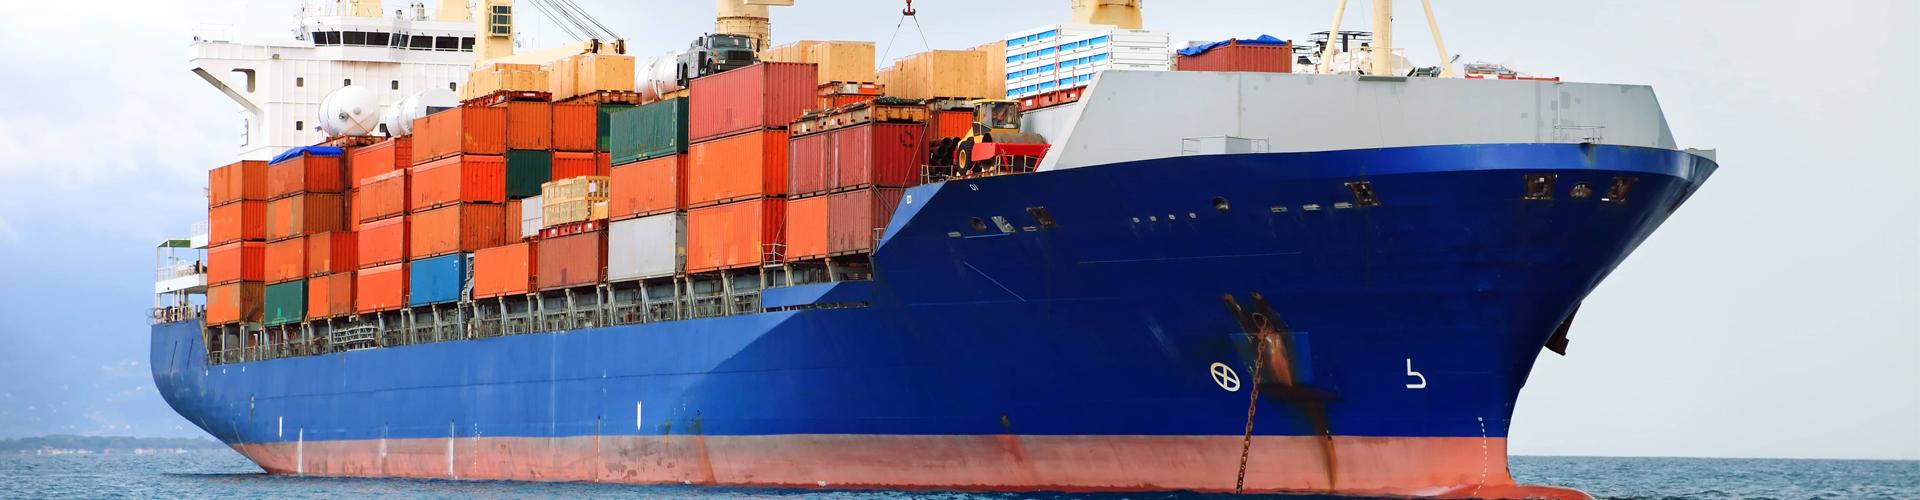 ship transporting cargo